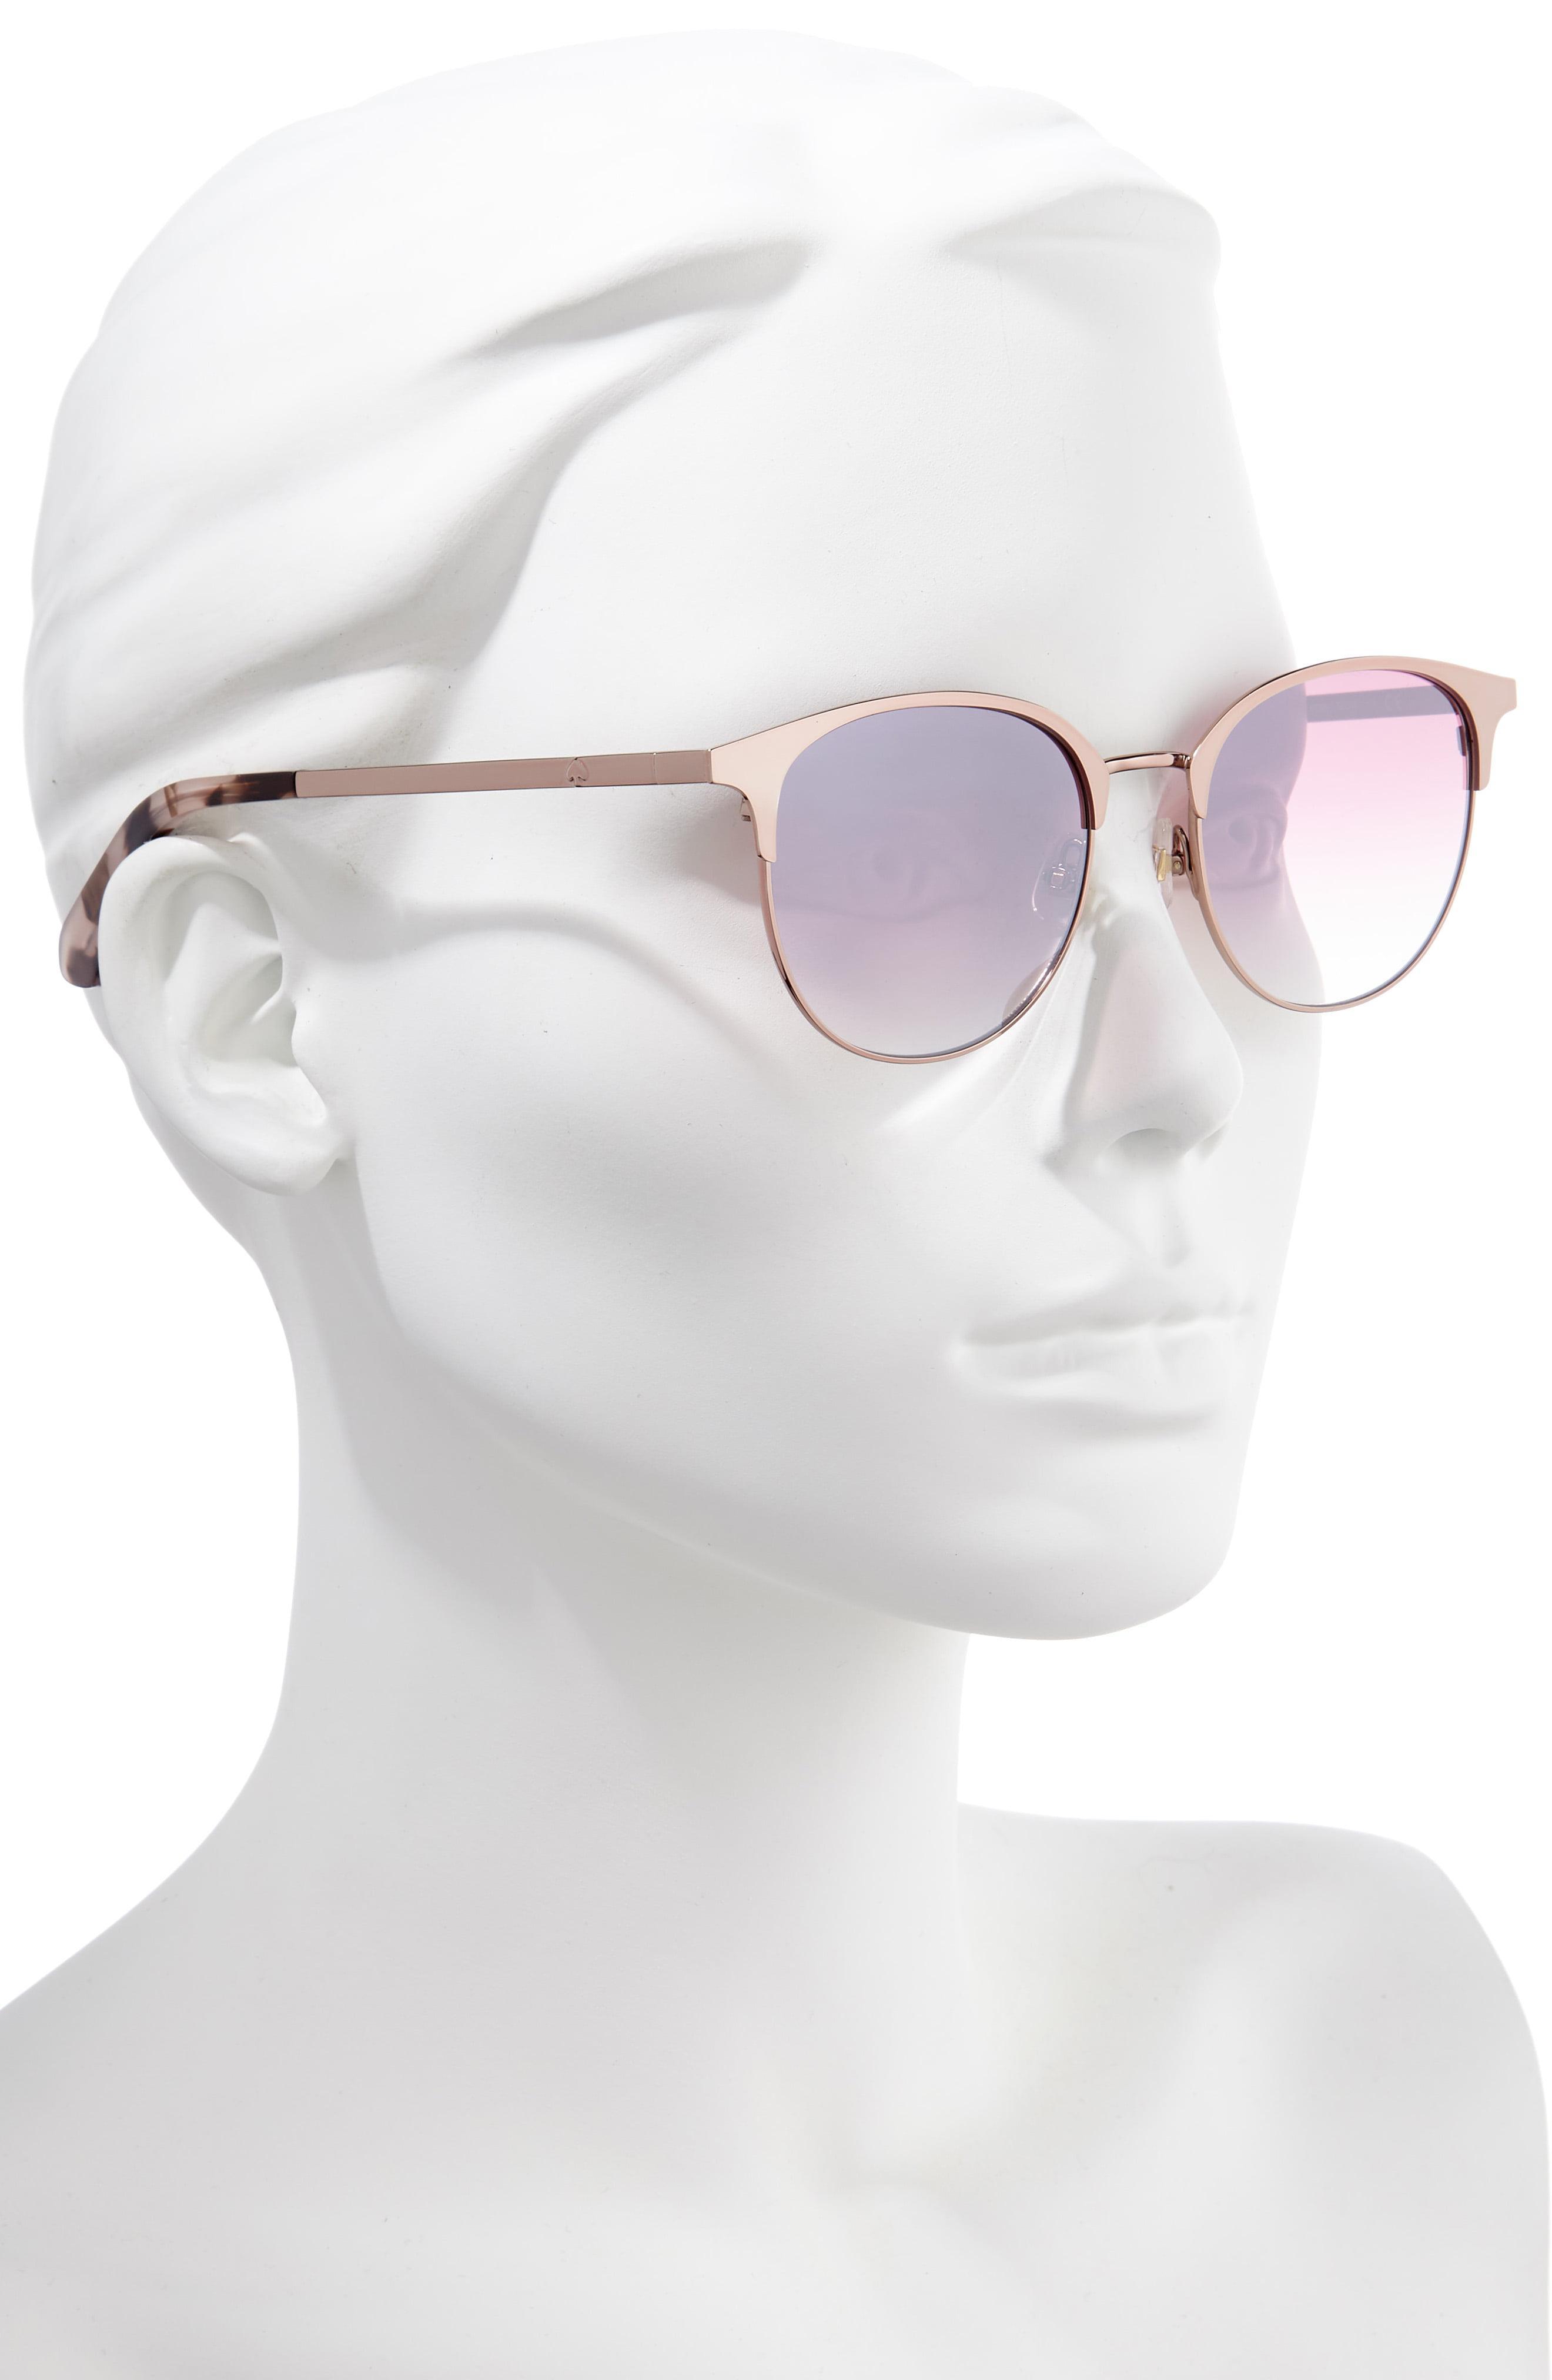 5b98c7b9cb6c Kate Spade - Pink Joelynn 52mm Sunglasses - Lyst. View fullscreen